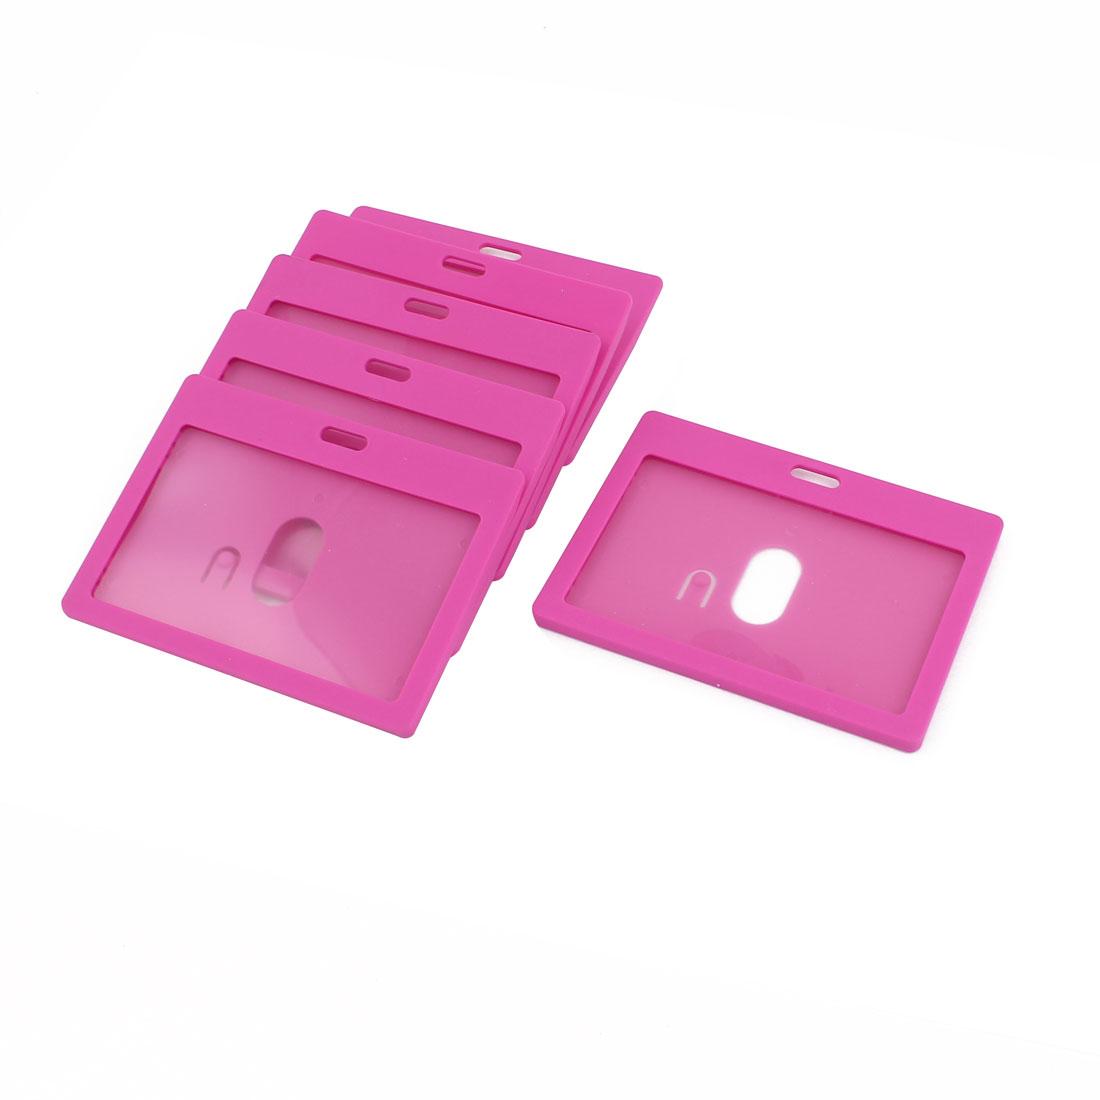 6pcs Fuchsia Plastic Horizontal School Work ID Holder Attachment Top 9cm x 5.4cm